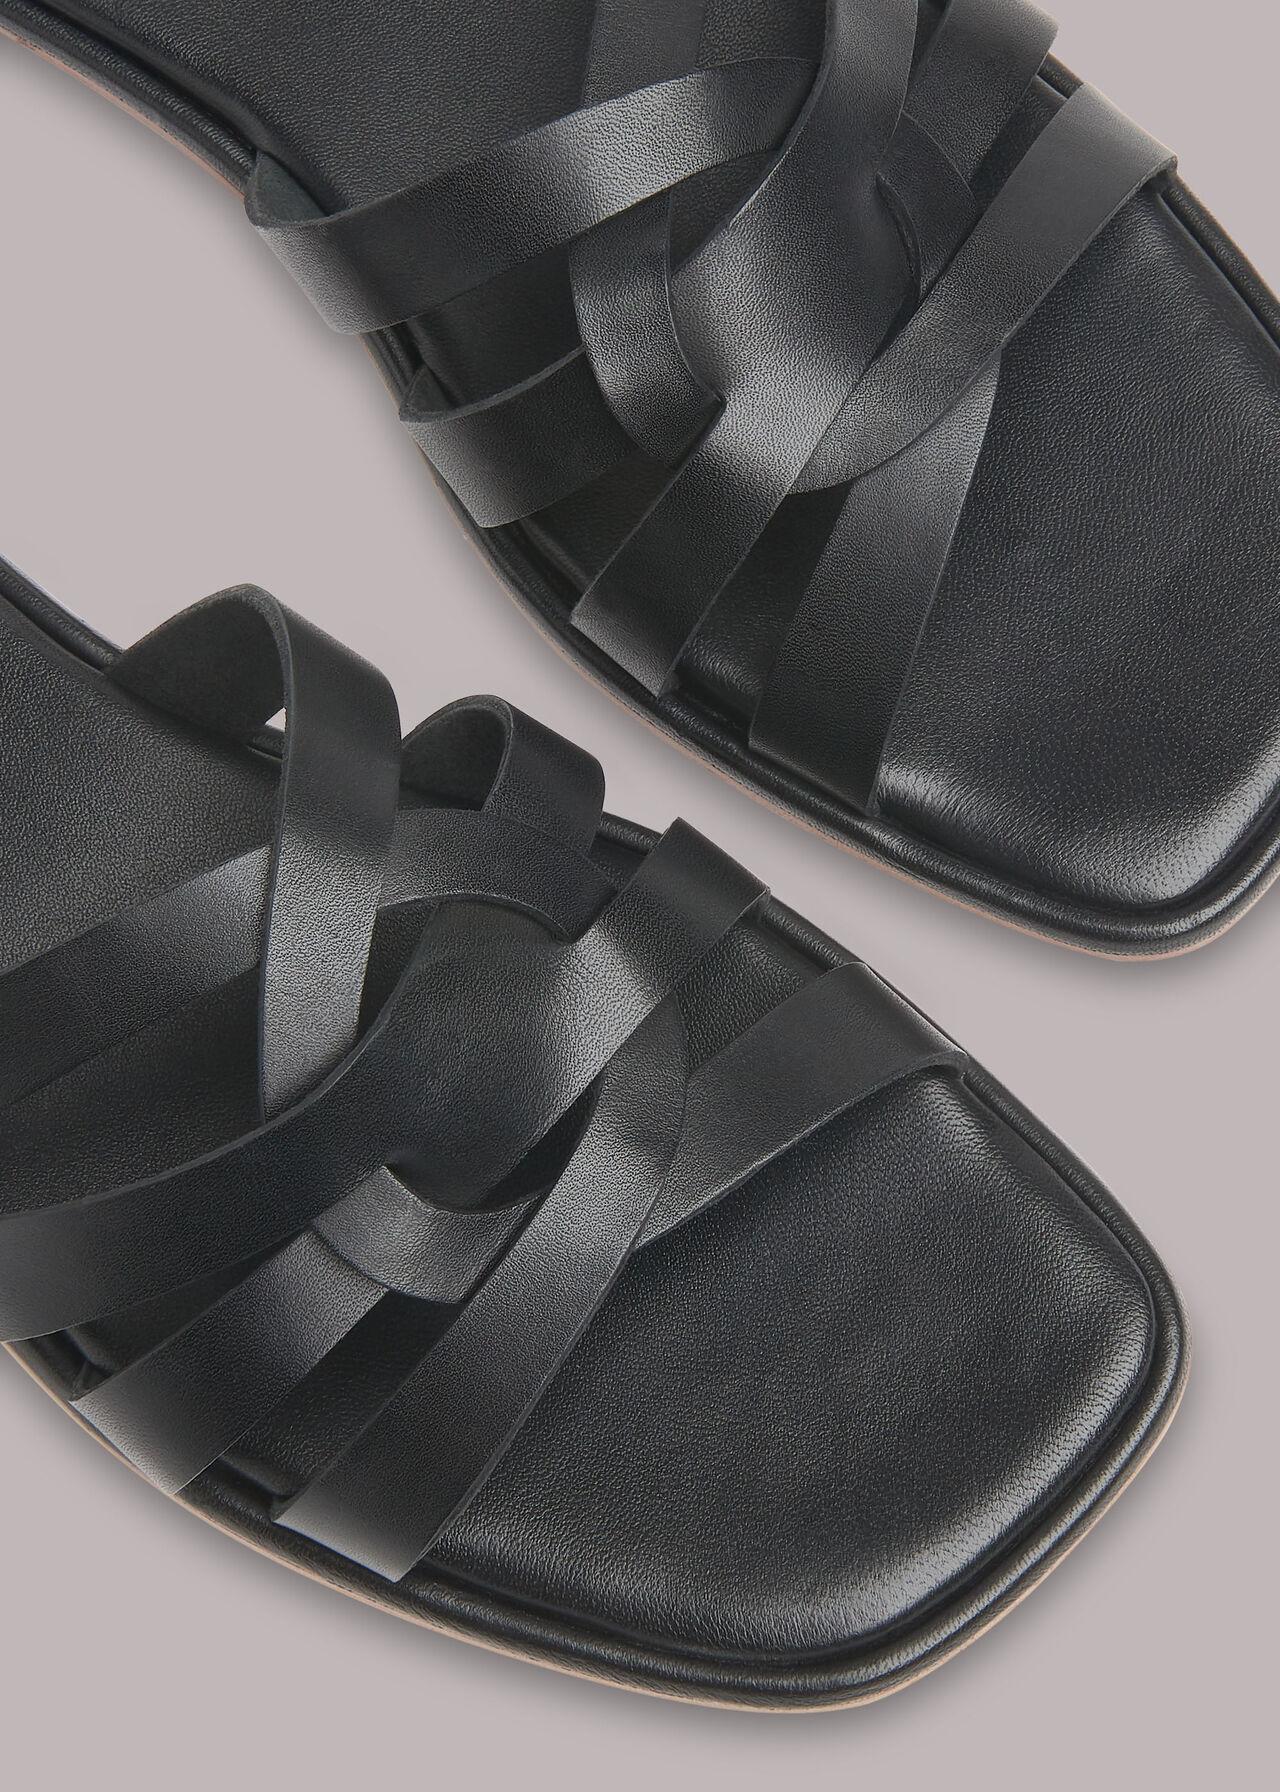 Cece Woven Slide